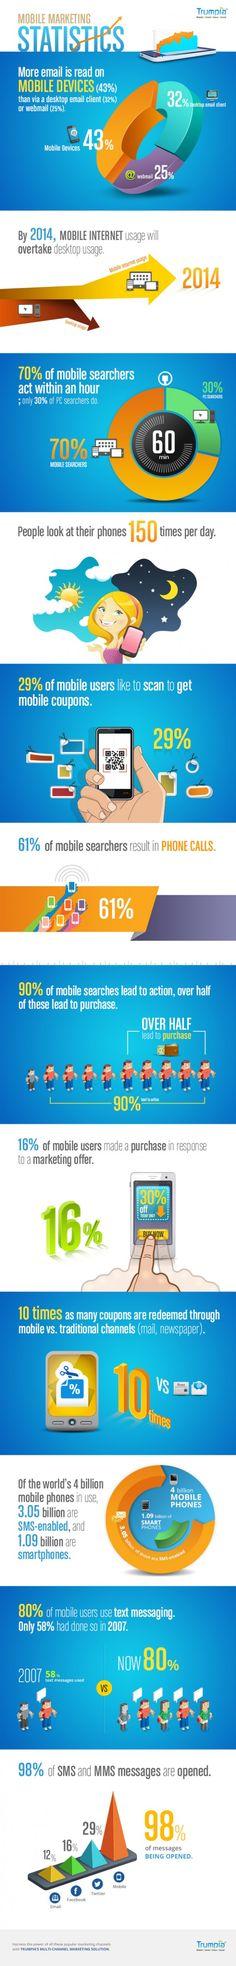 #Mobile #Marketing #Statistics  #Infographic